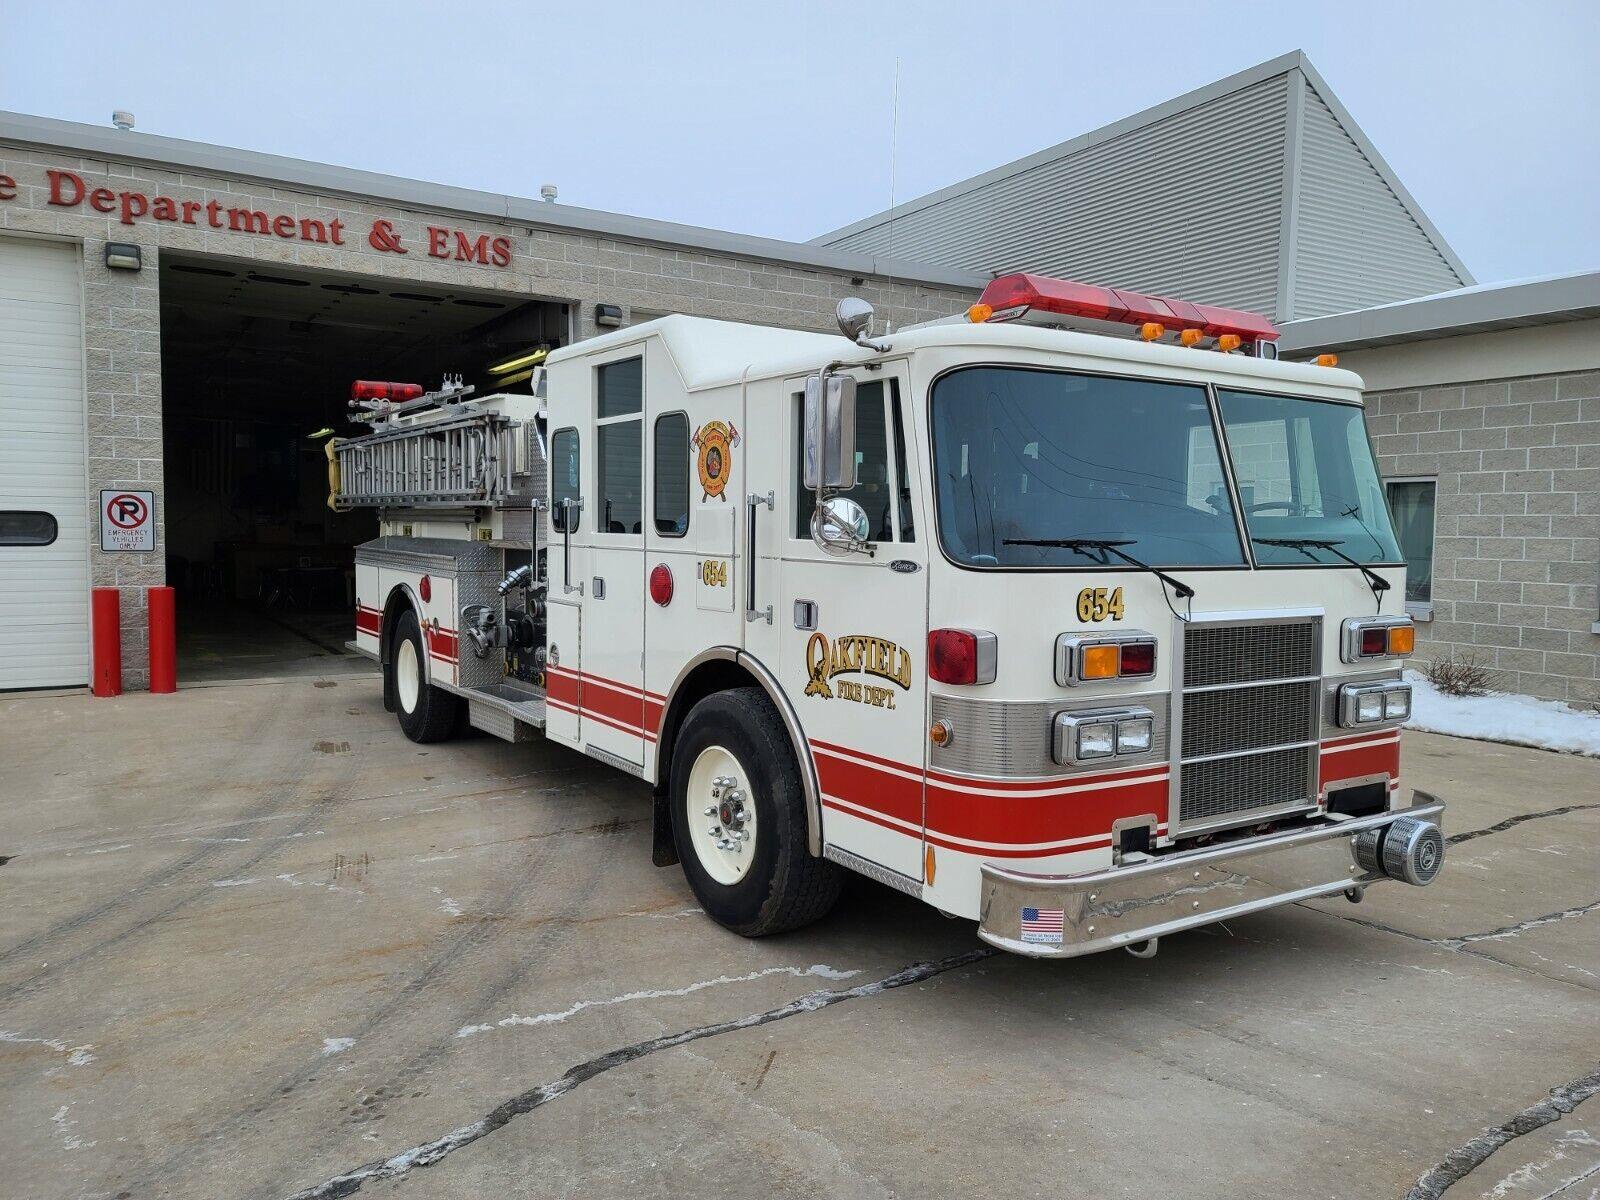 1994 Pierce Lance 1250/750 4-Door Engine Pumper Fire Truck